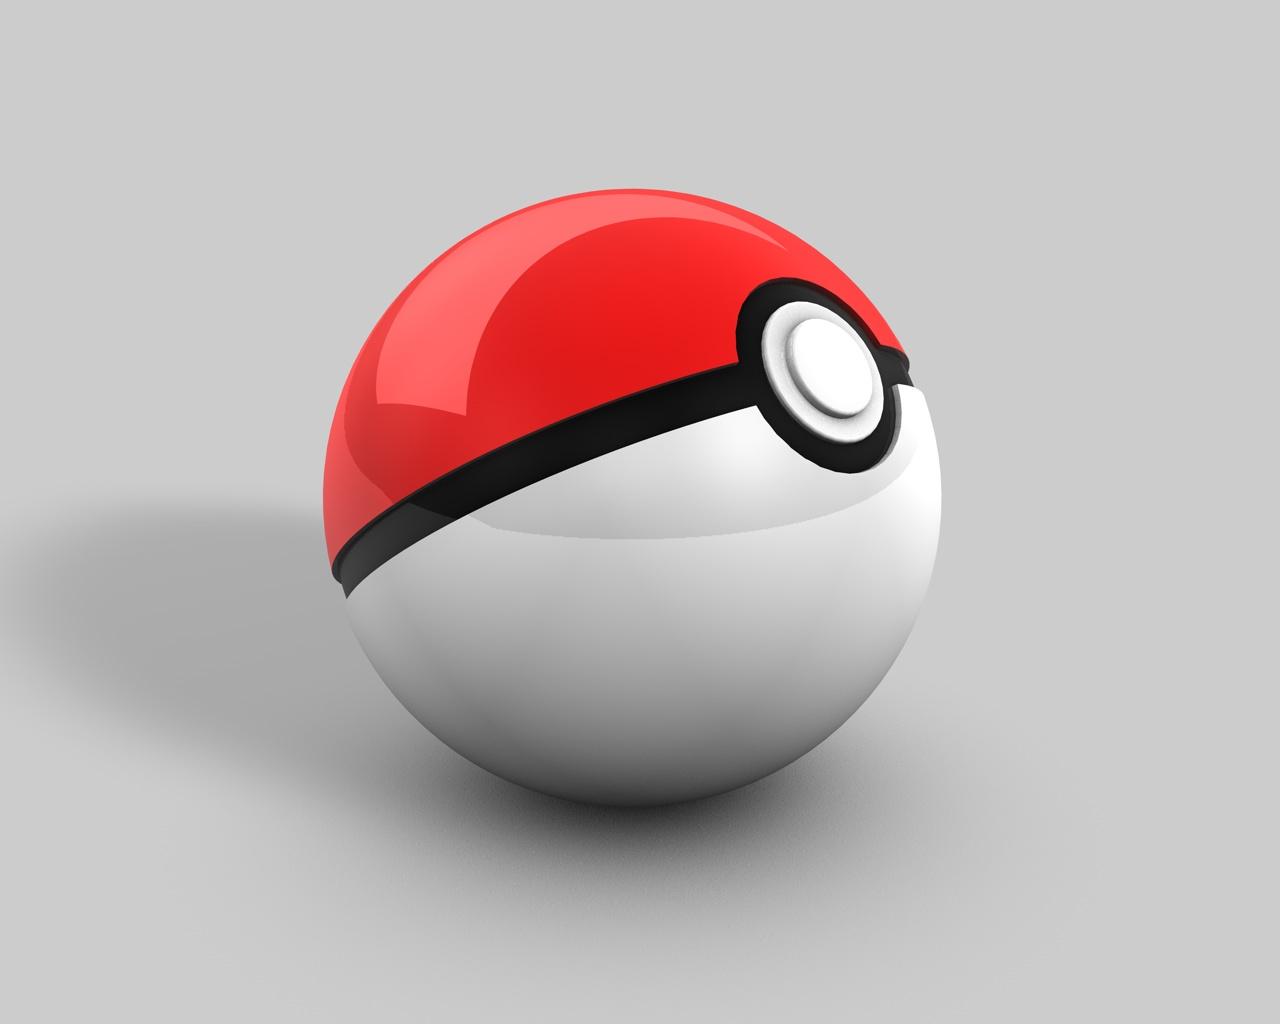 pokemon ball images pokemon images